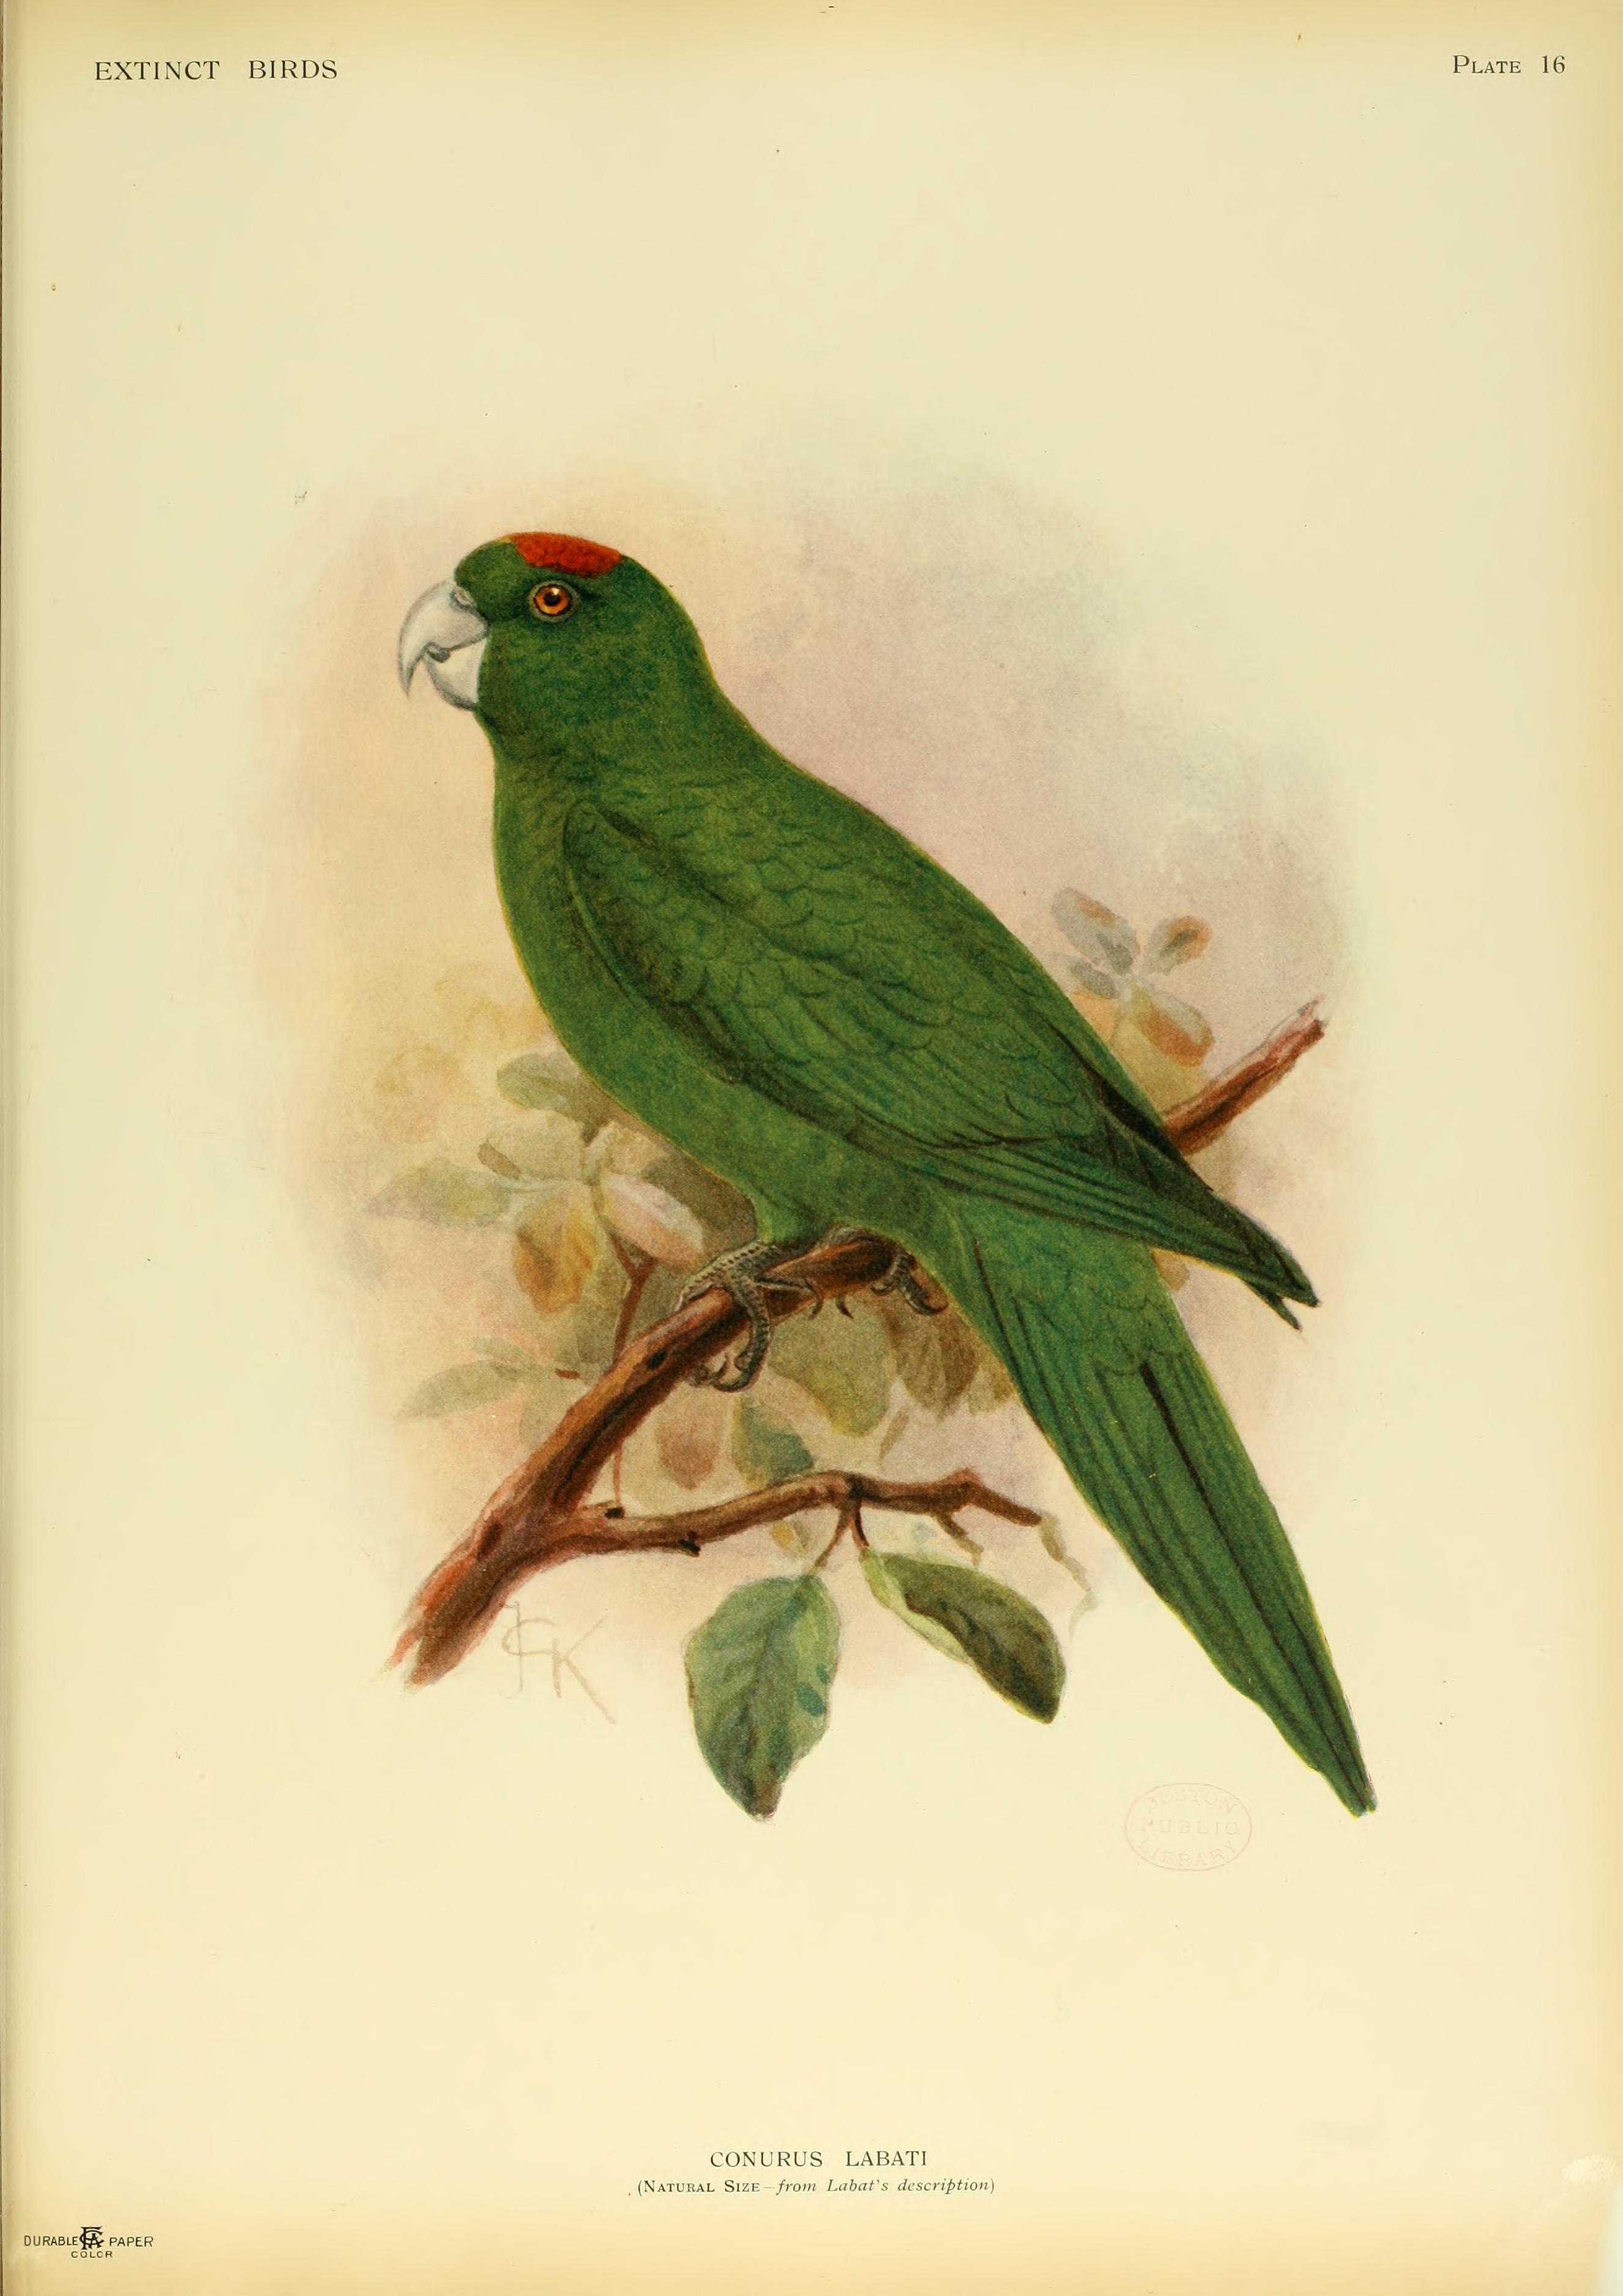 http://upload.wikimedia.org/wikipedia/commons/c/ca/Extinctbirds1907_P16_Conurus_labati0313.png